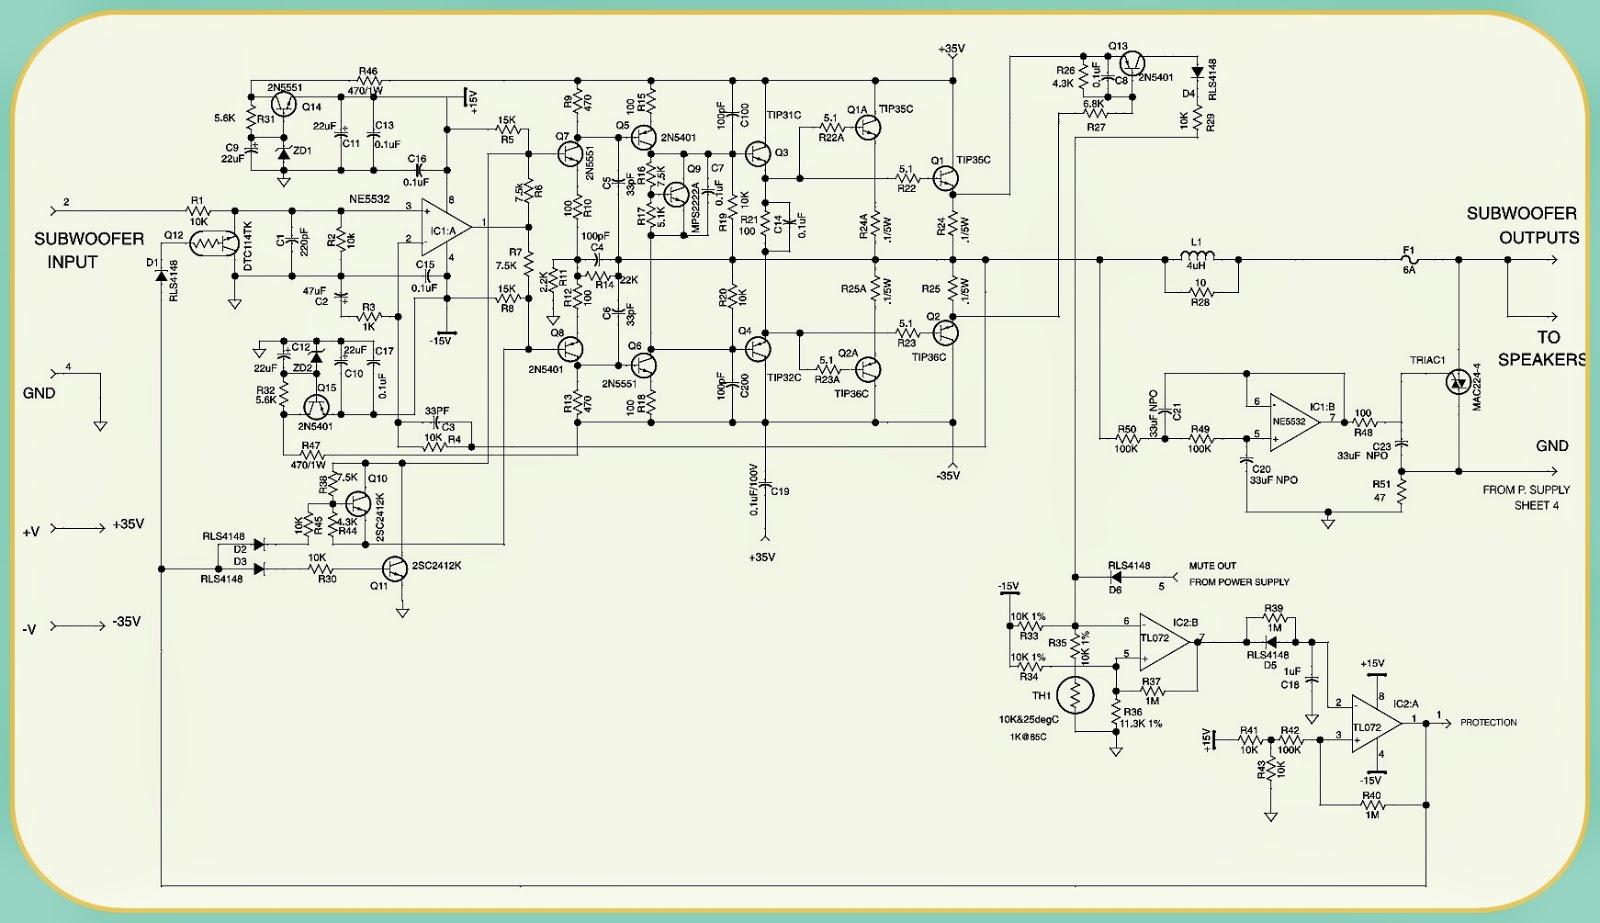 Jbl B550 Subwoofer Wiring Diagram - Wiring Diagram Posts Vauxhall Subwoofer Wiring Diagram on